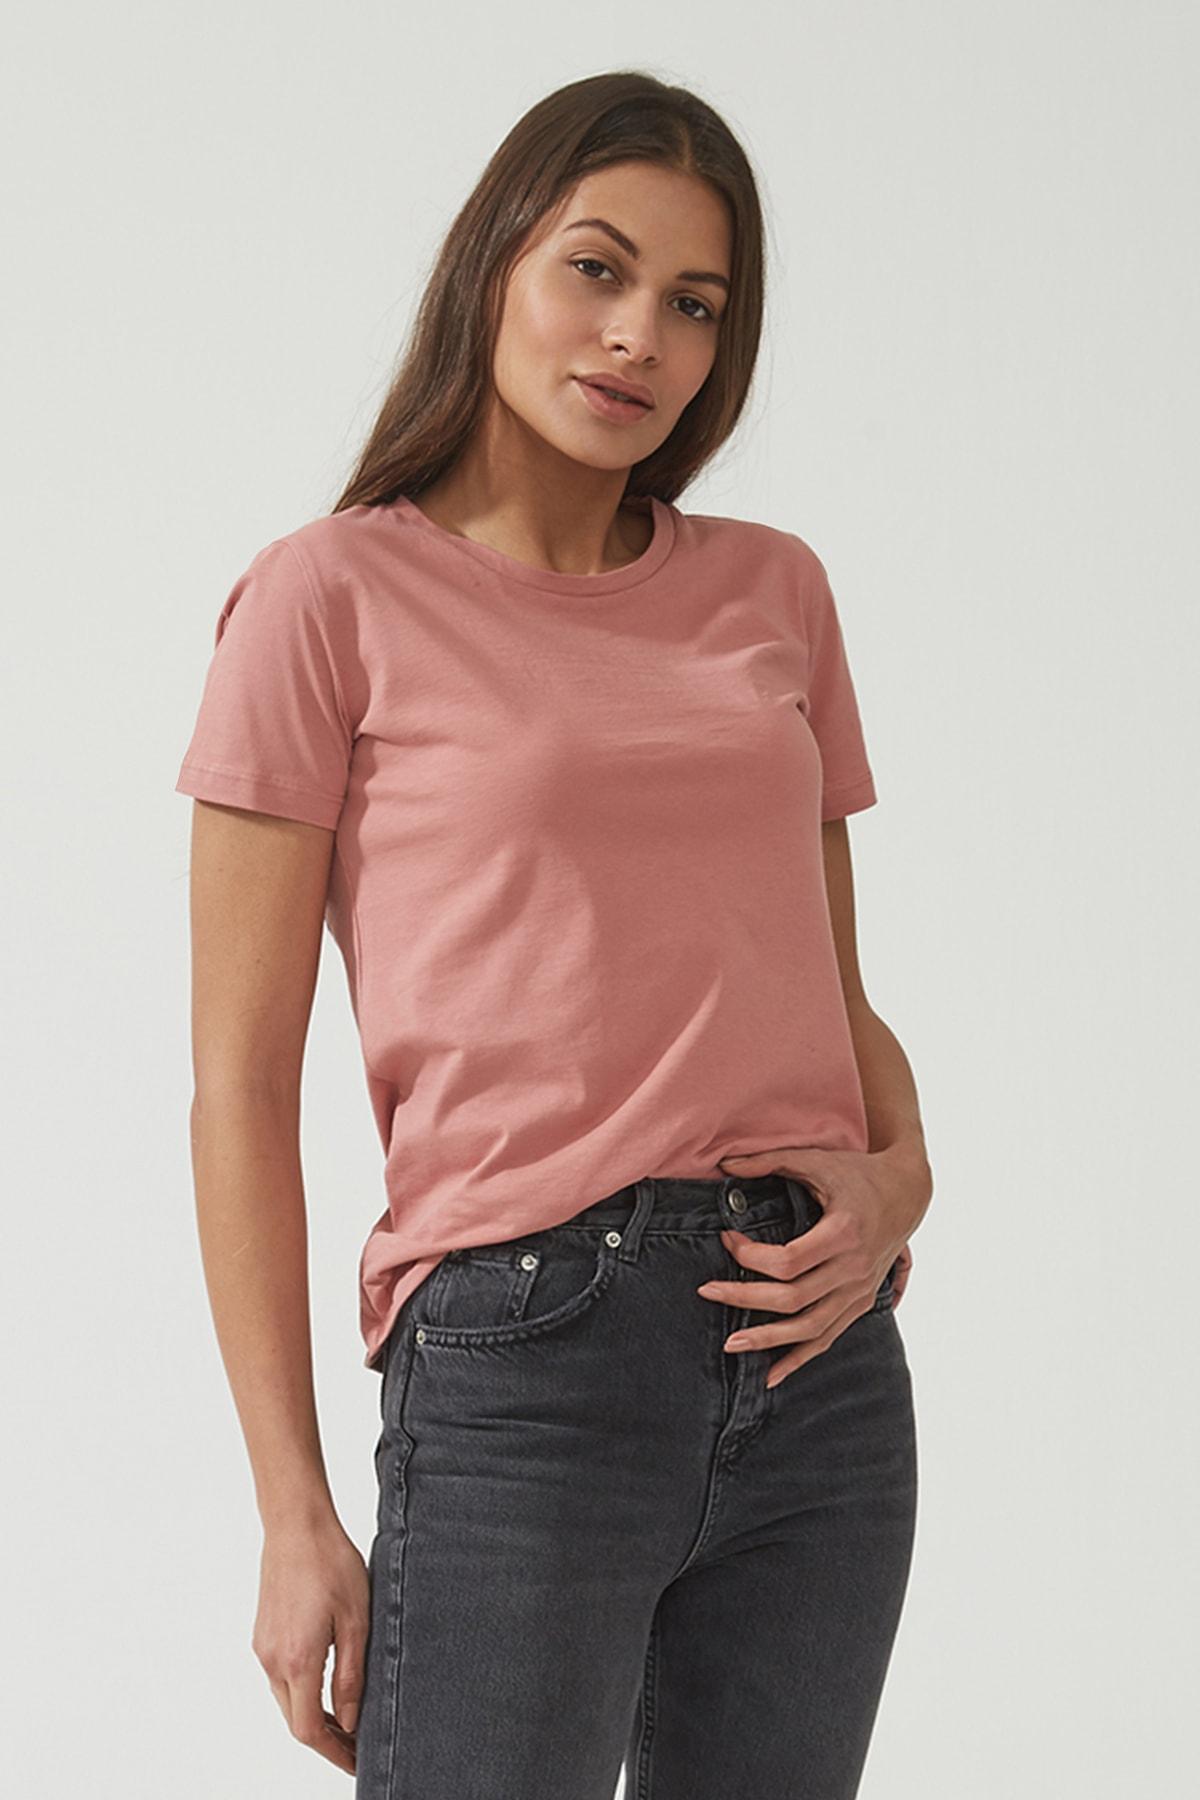 Kadın Gül Kurusu Bisiklet Yaka Regular Basic T-shirt 55795-615